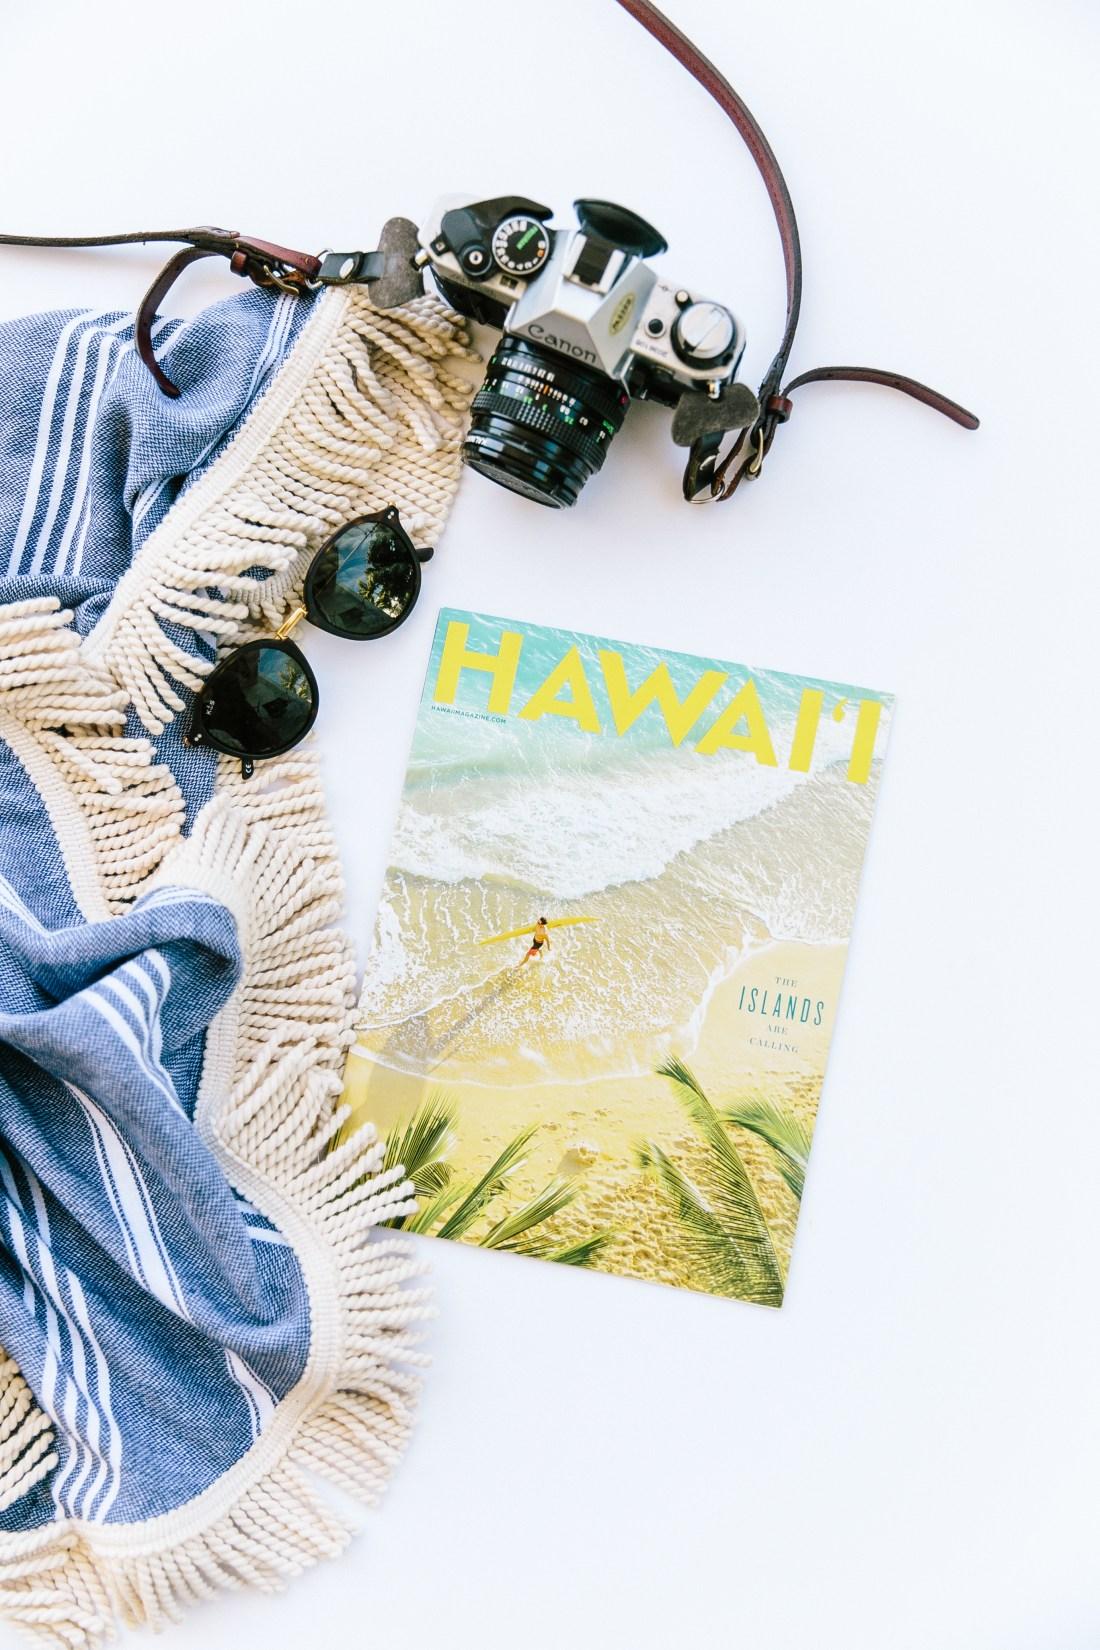 ElanaLoo Featured By Hawaii Magazine | Hawaii Magazine Contributor | Travel Writer ElanaLoo | Travel Blogger | Hawaii Blogger | Perfect Beach Day Set Up | Beach Bag via @elanaloo + elanaloo.com